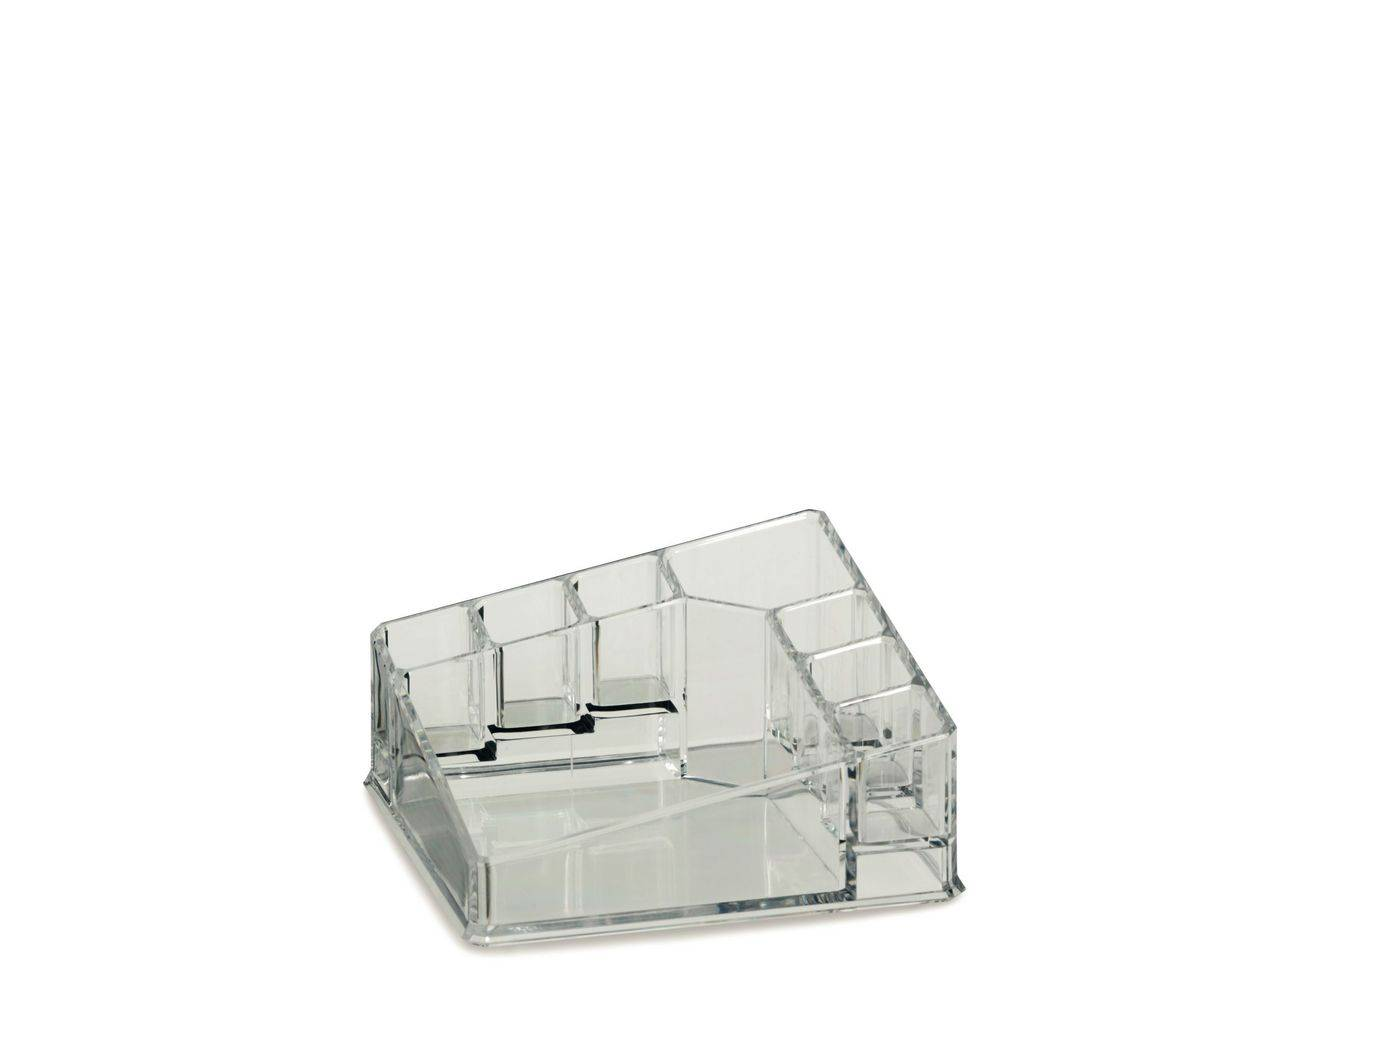 Kosmetická dóza SAFIRA plast, transparent, 14x14x6,5cm - Kela